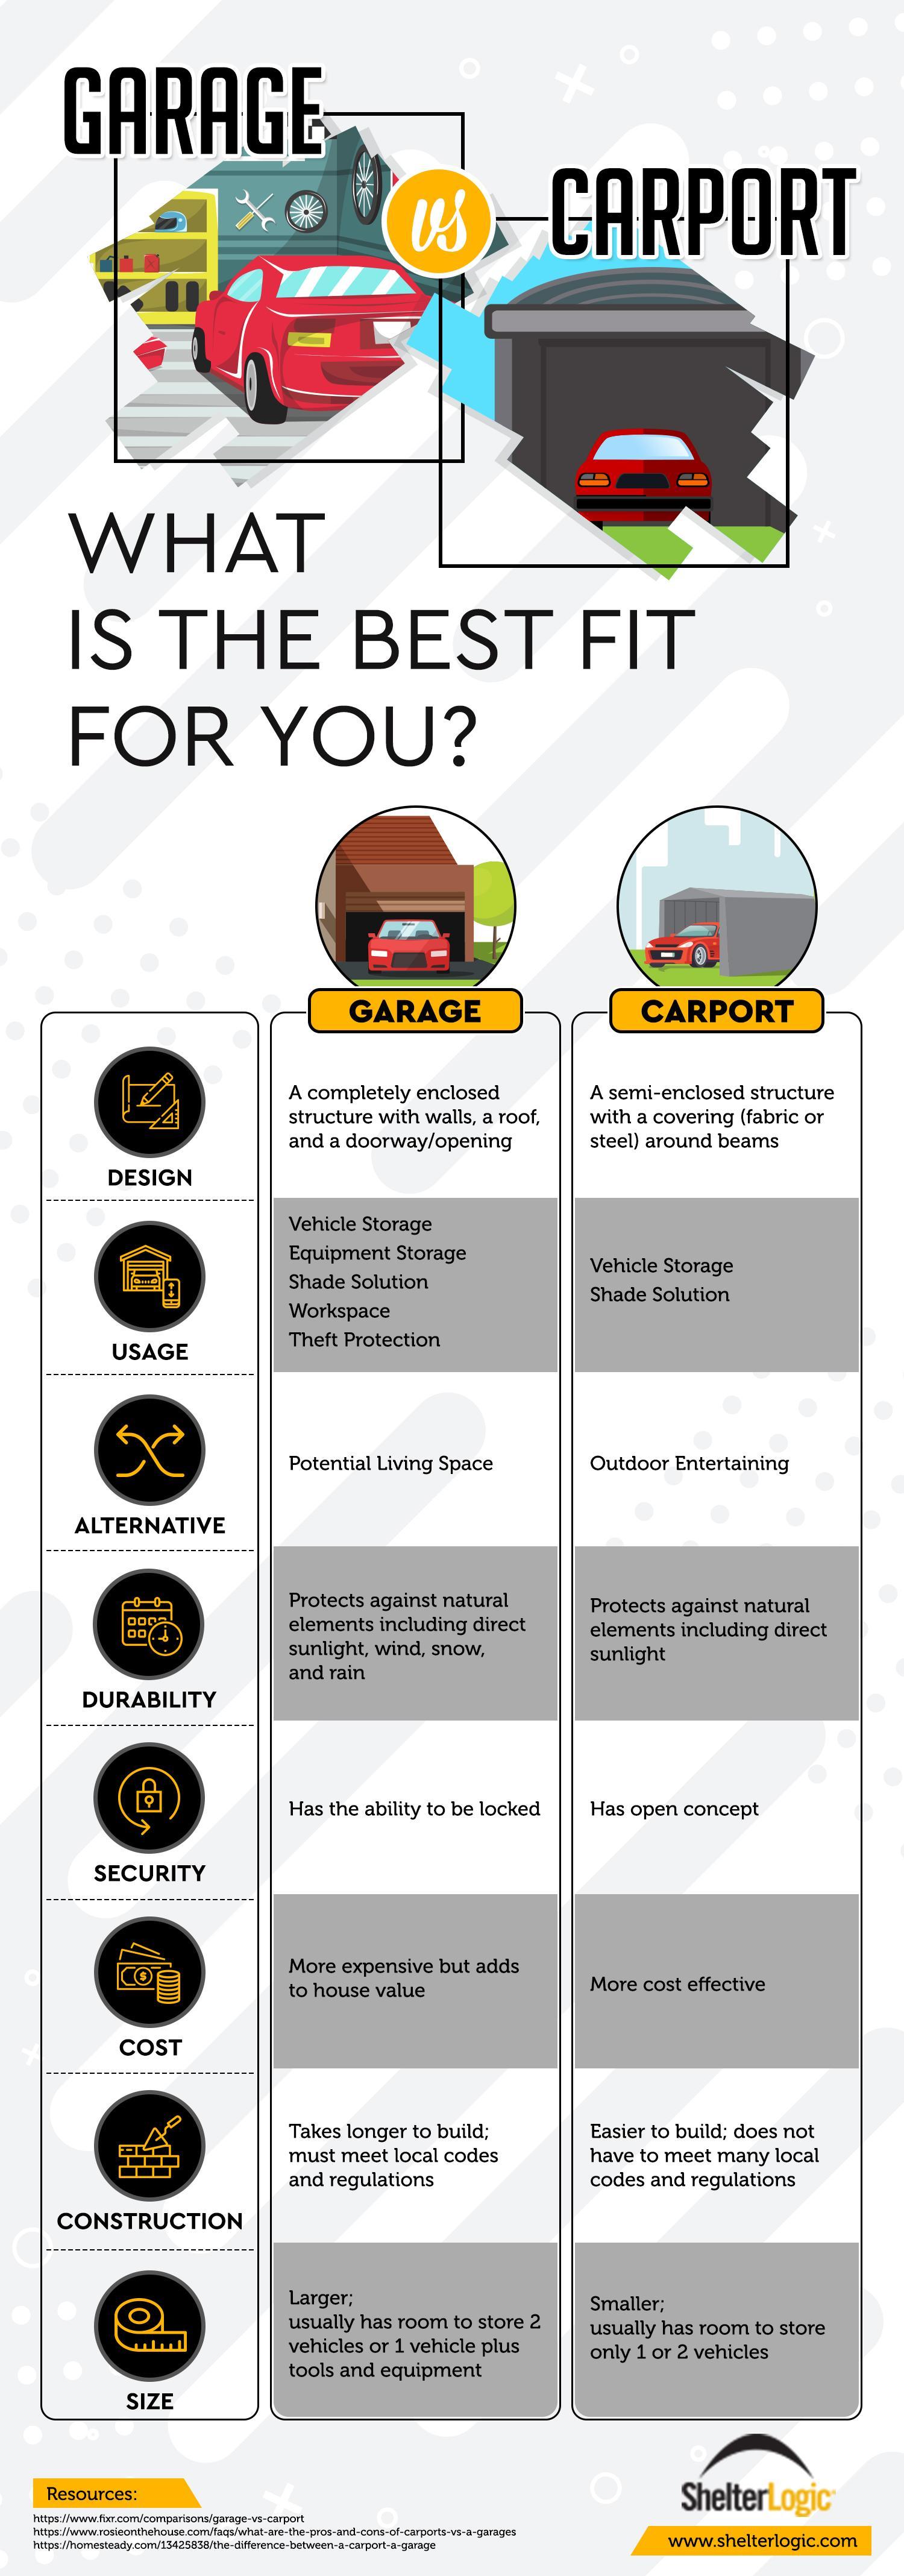 Garage v. Carport infographic